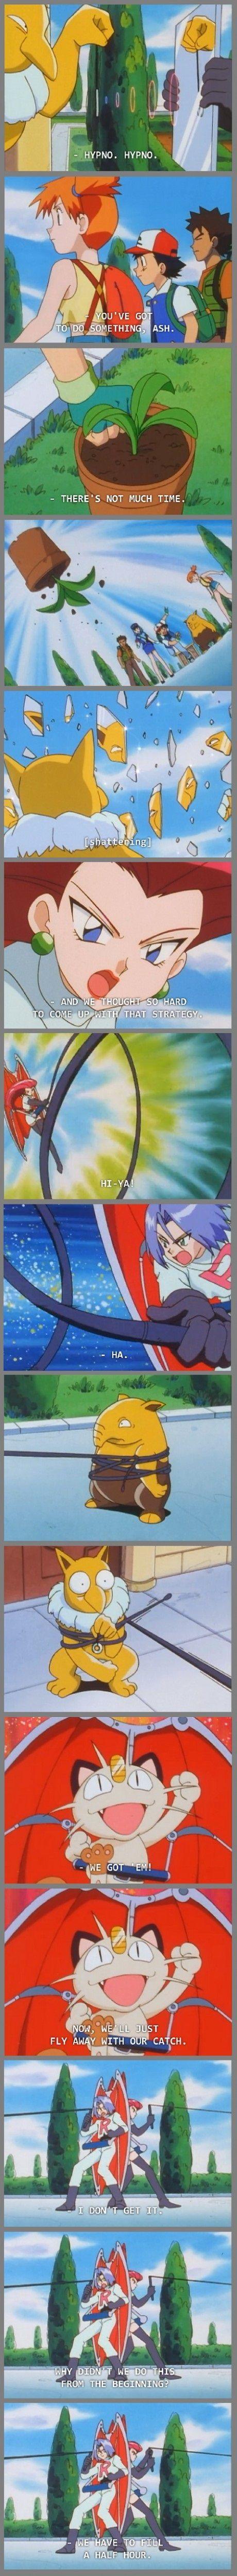 Pokemon breaking the fourth wall